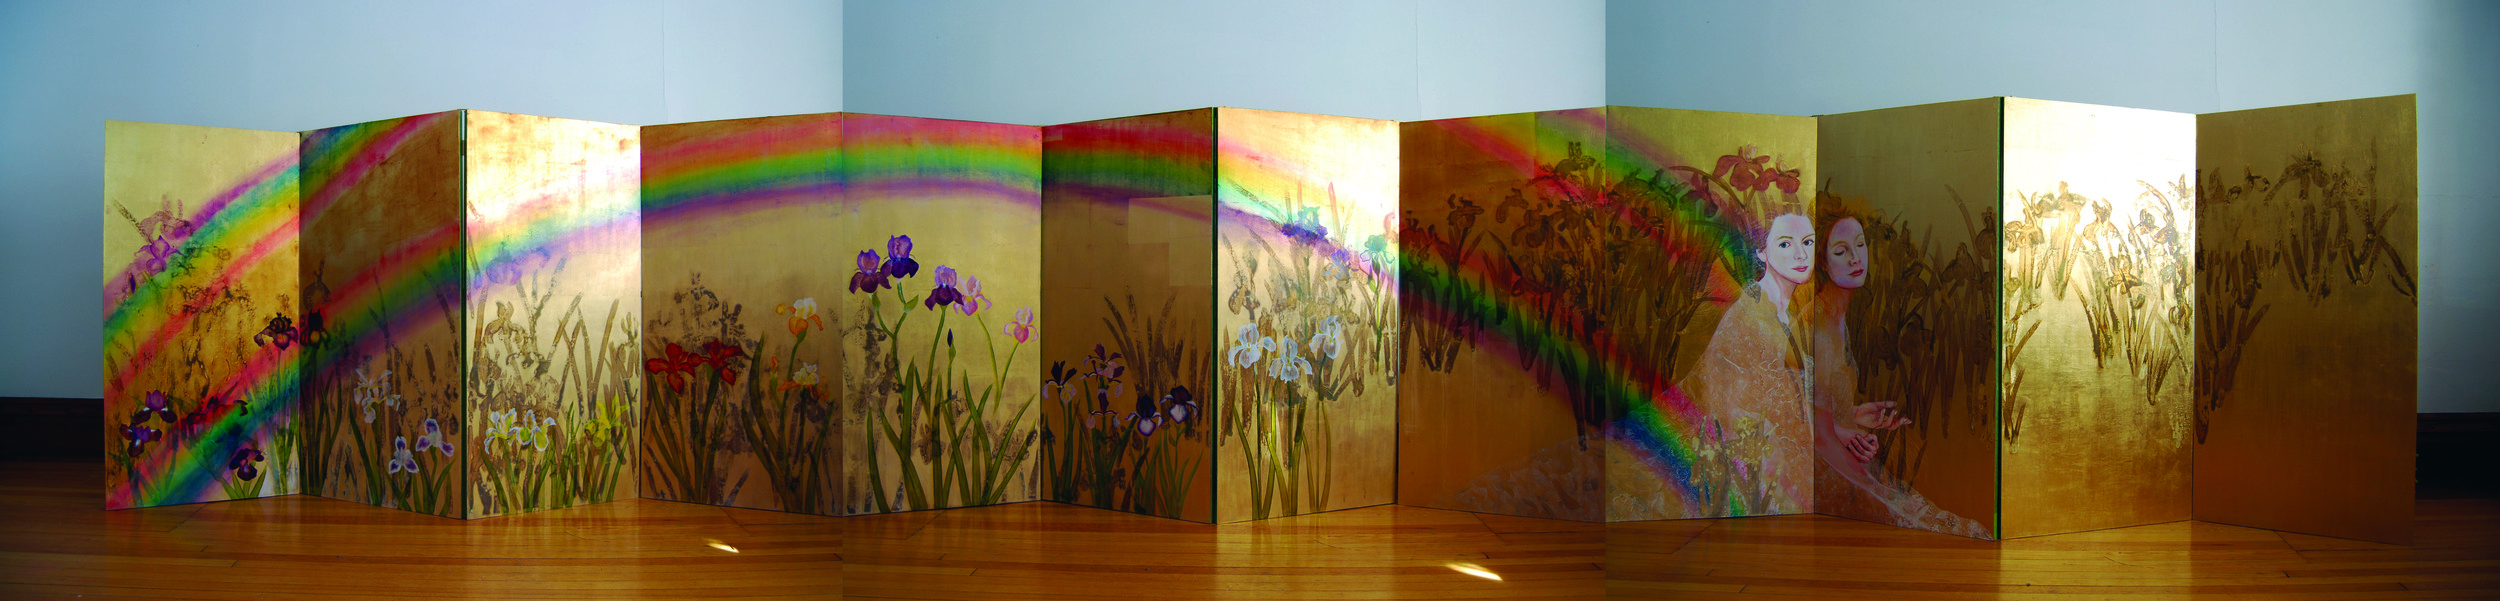 KS-054, KaeSasak, Iris Screens, 2015, Oil and Patina on Goldleafed Panels, 48X288